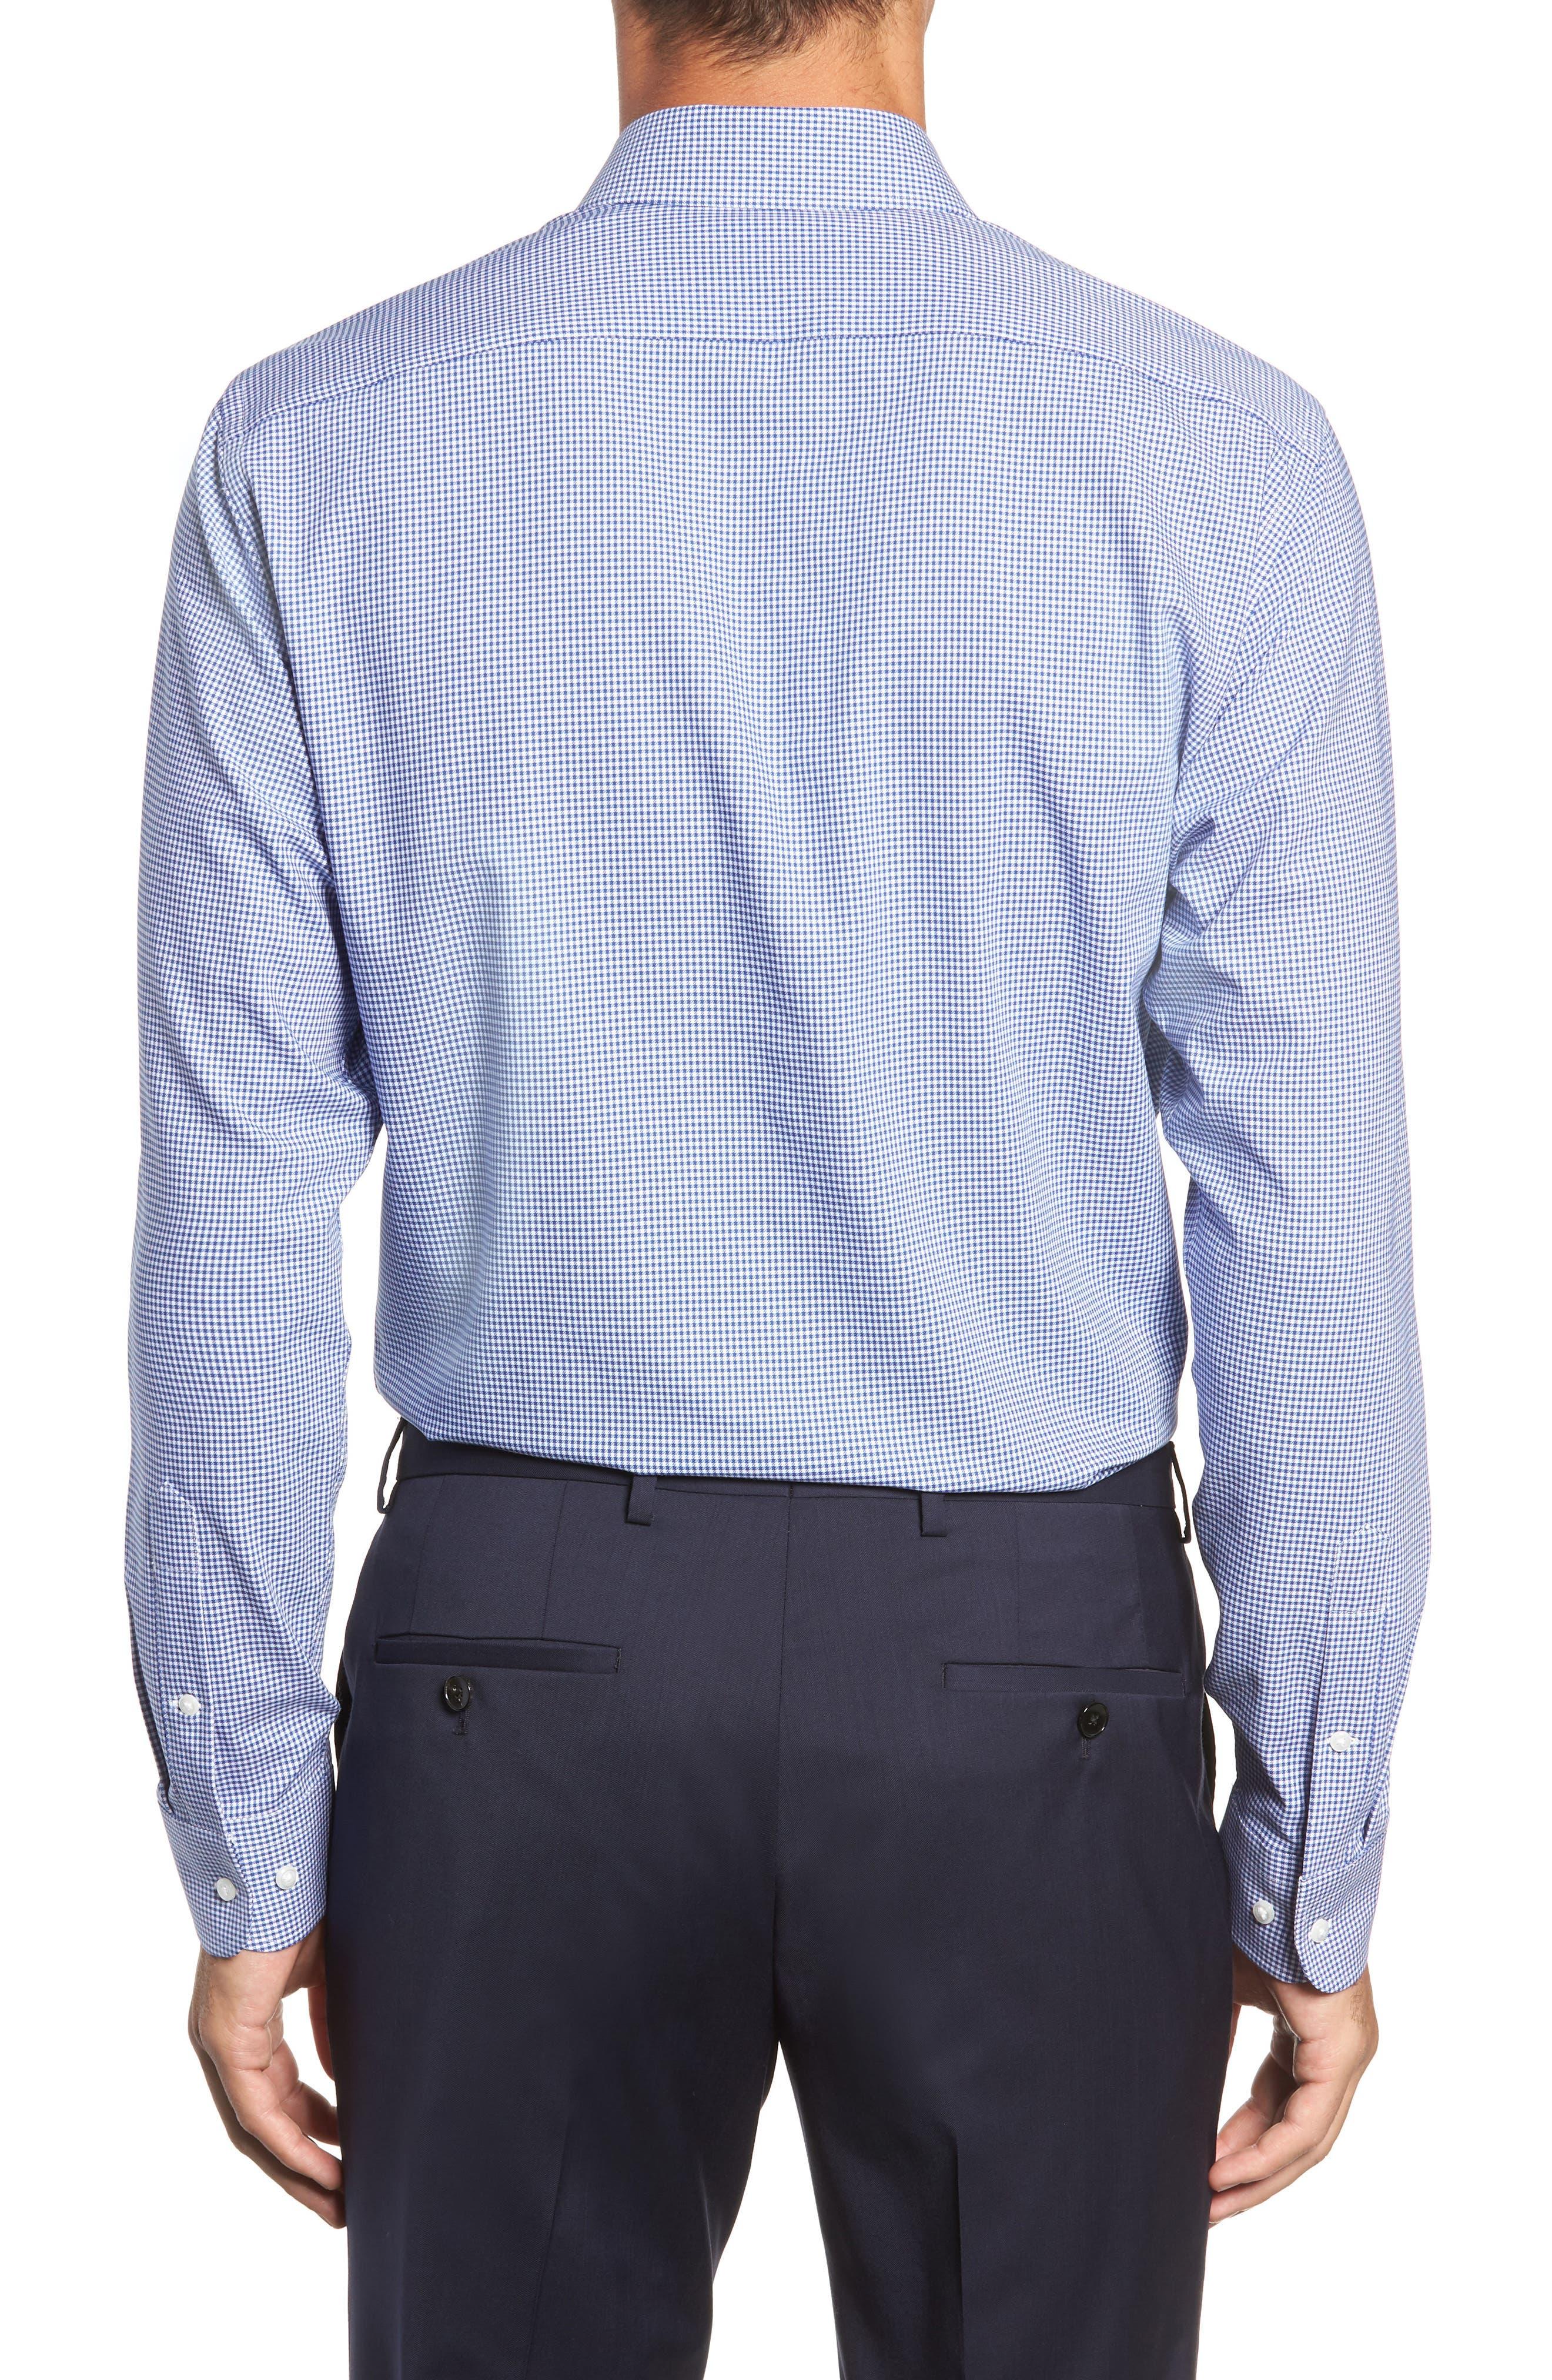 Tech-Smart Trim Fit Stretch Check Dress Shirt,                             Alternate thumbnail 3, color,                             BLUE MARINE